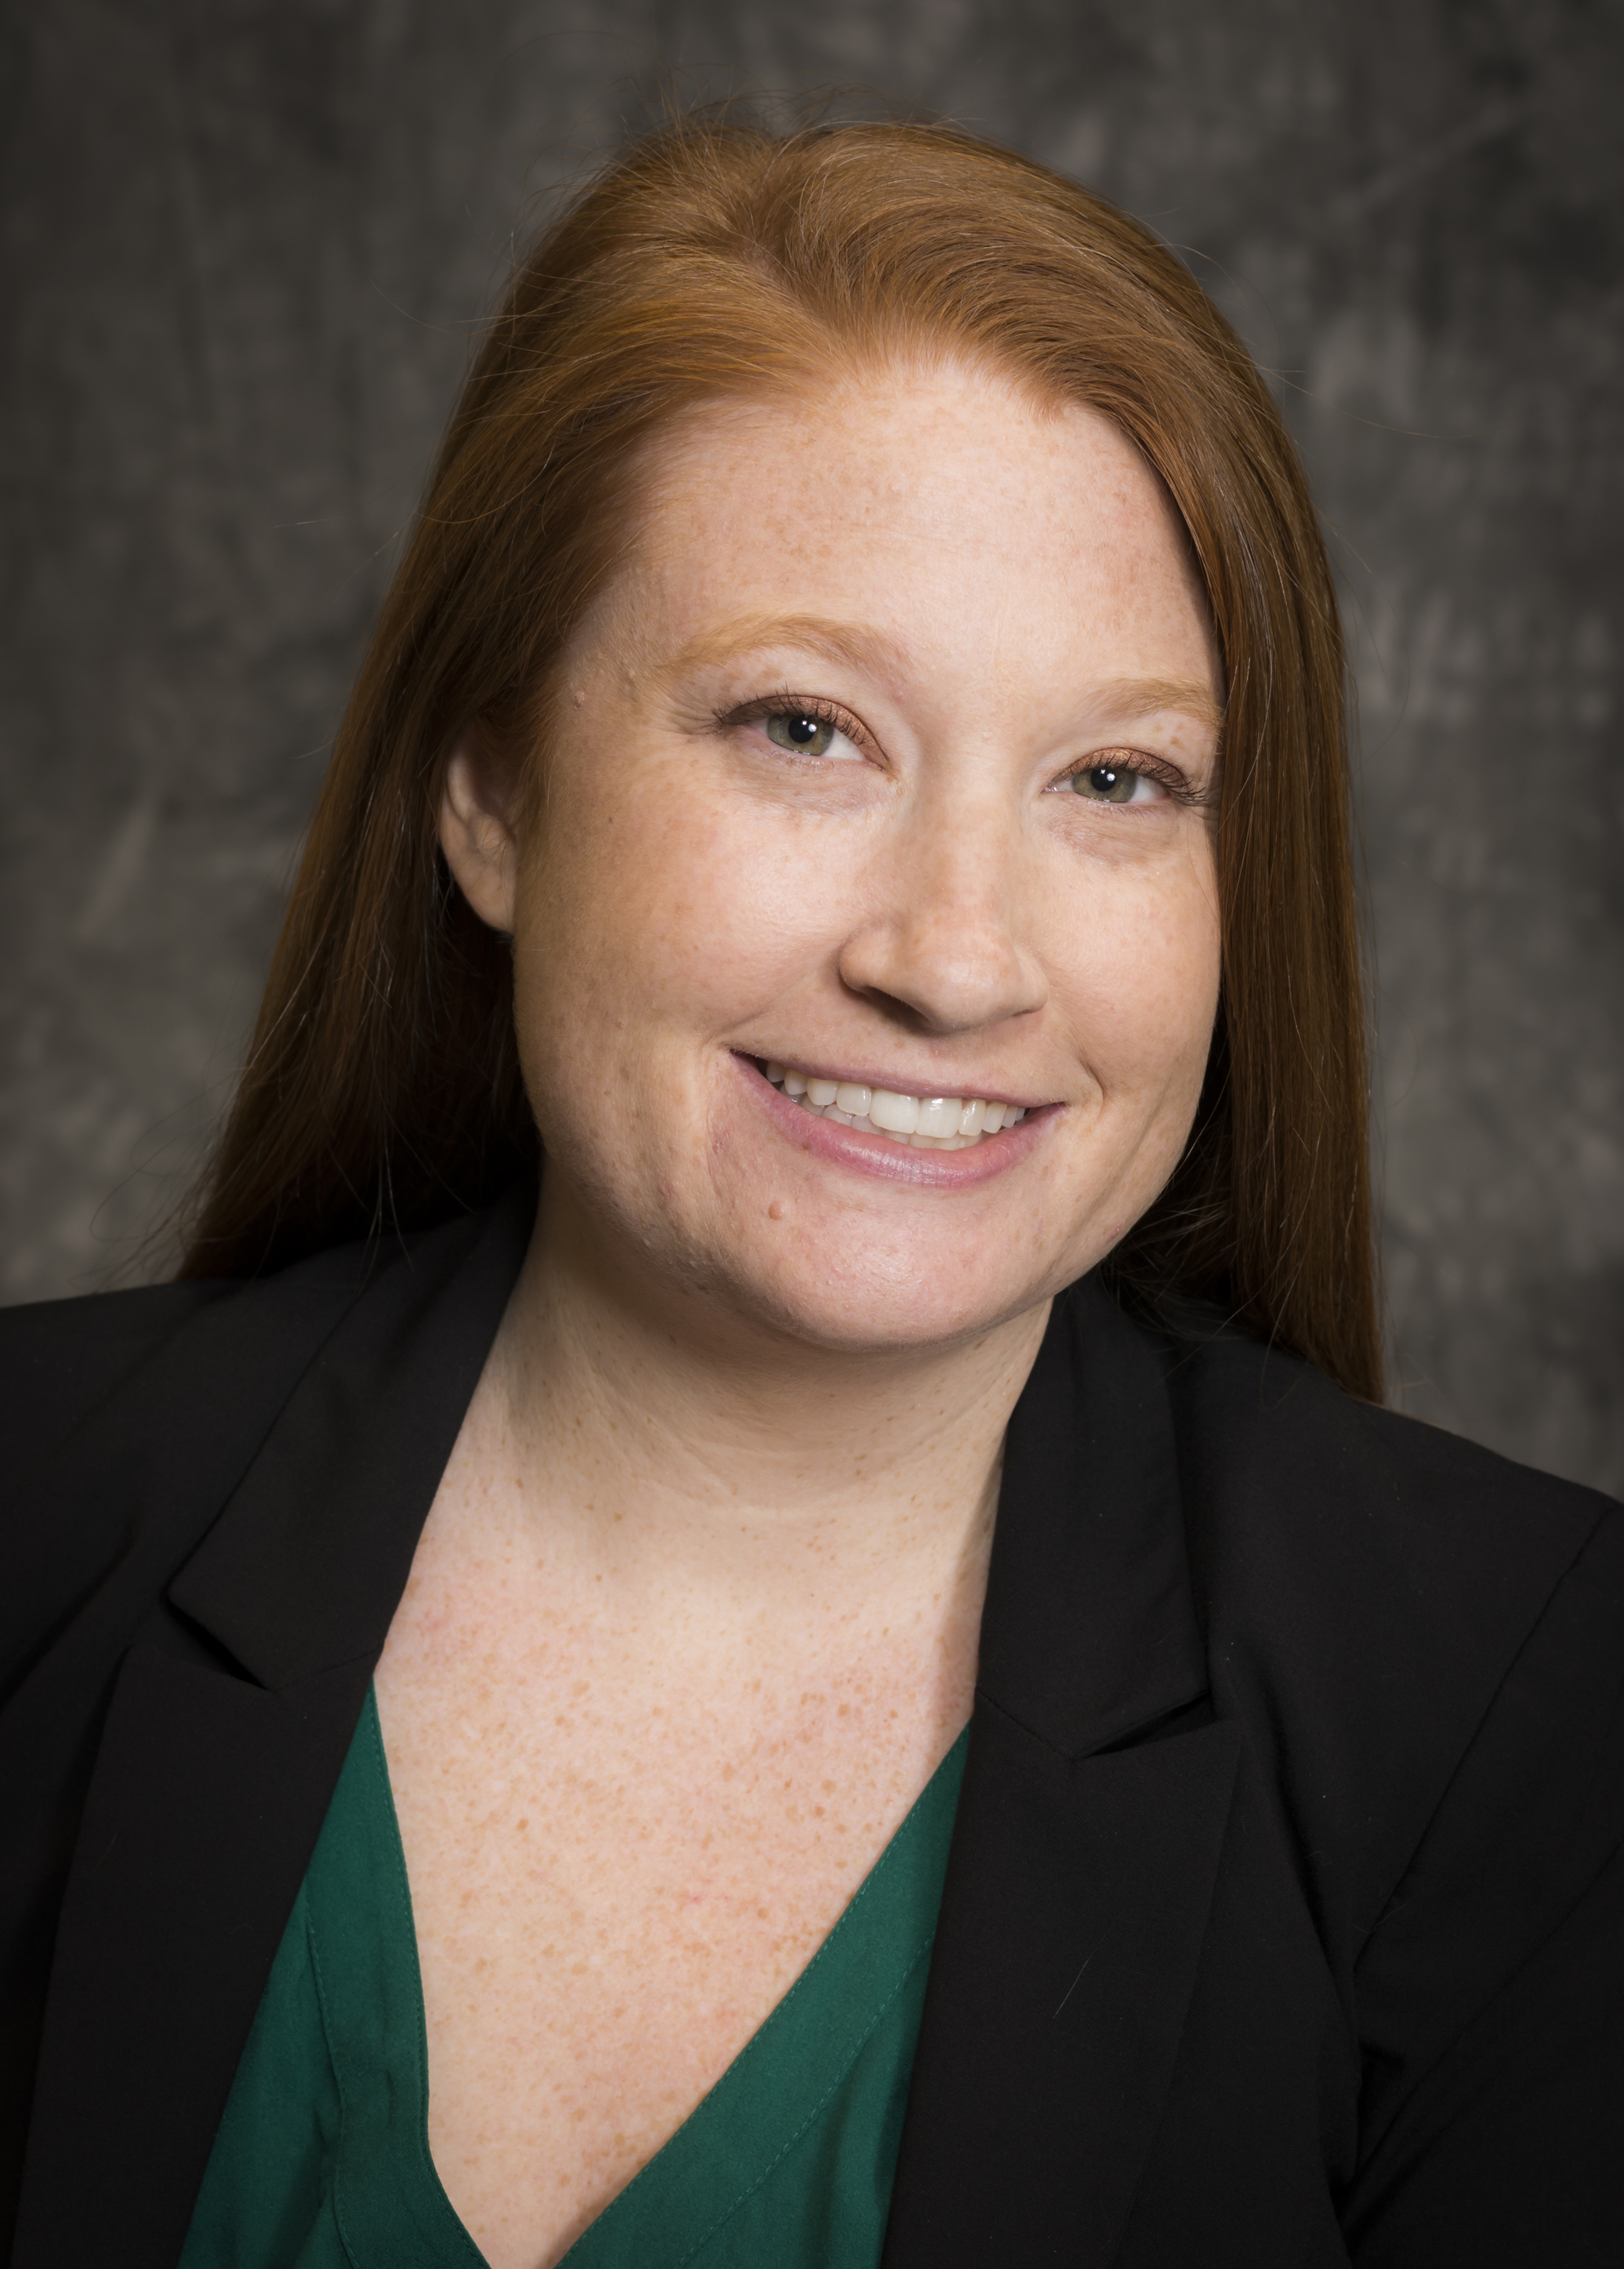 head shot photo of Leslie Krigstein